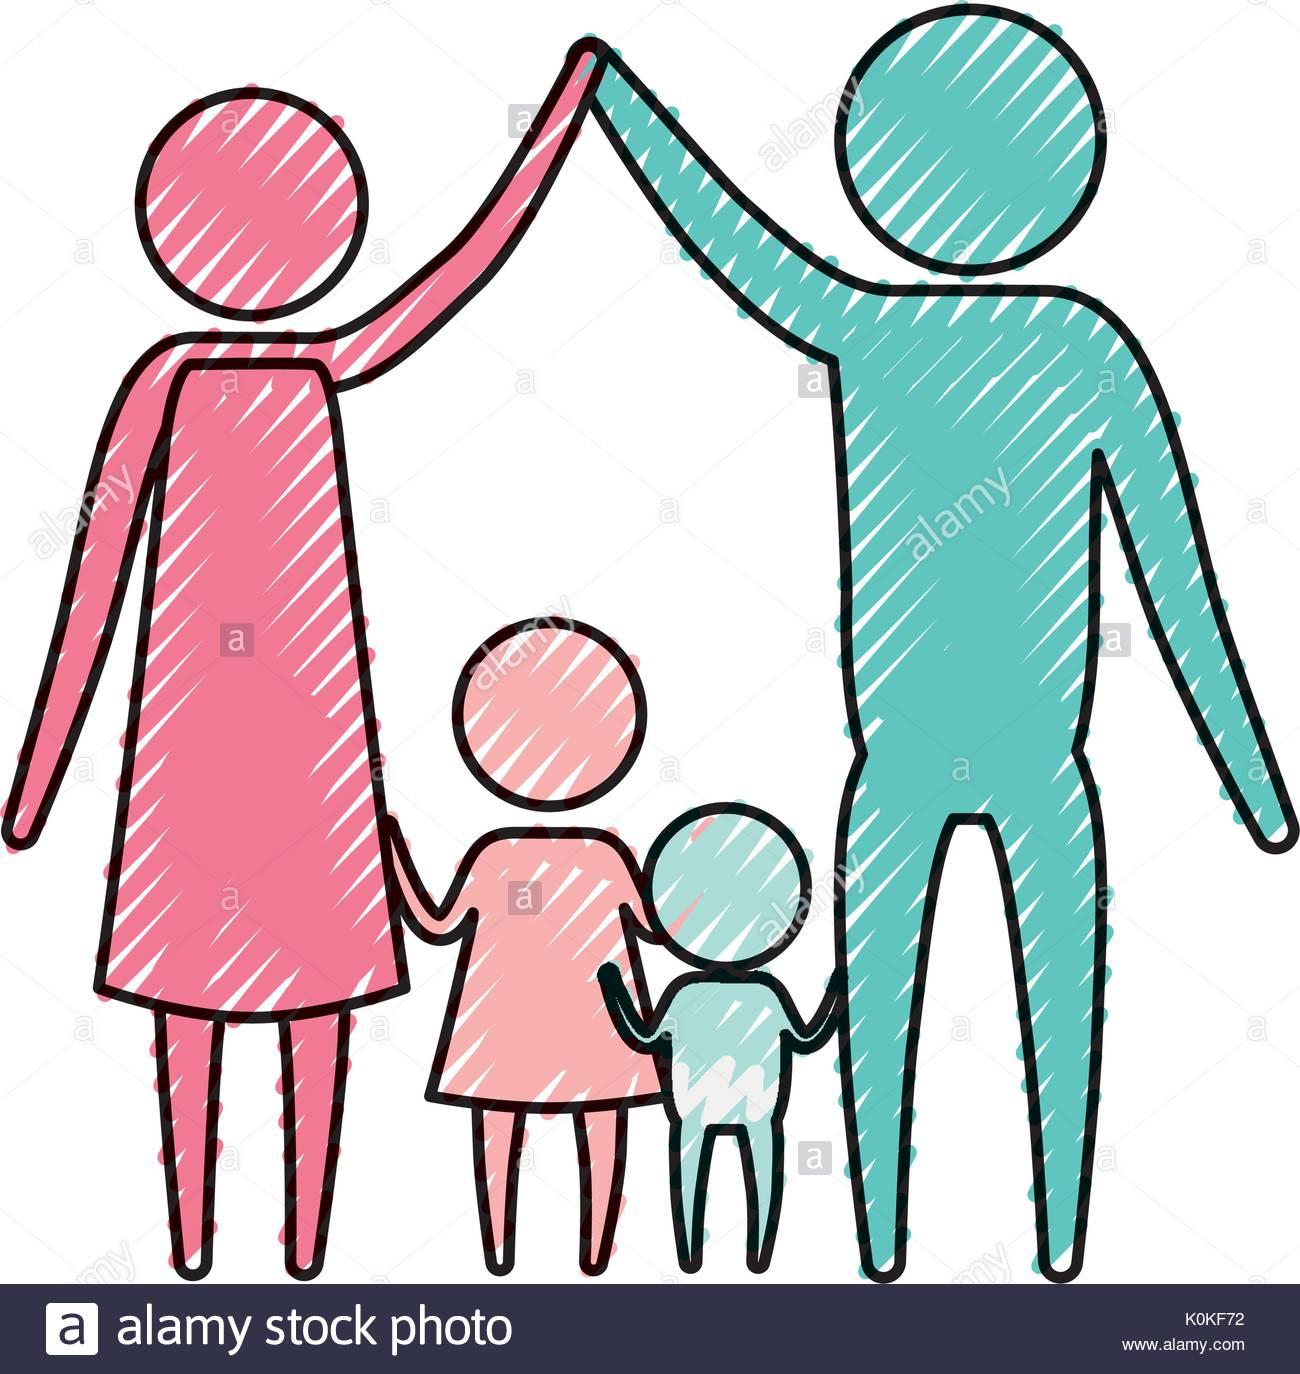 1300x1374 Color Crayon Silhouette Pictogram Couple Parents Holding Hands Up